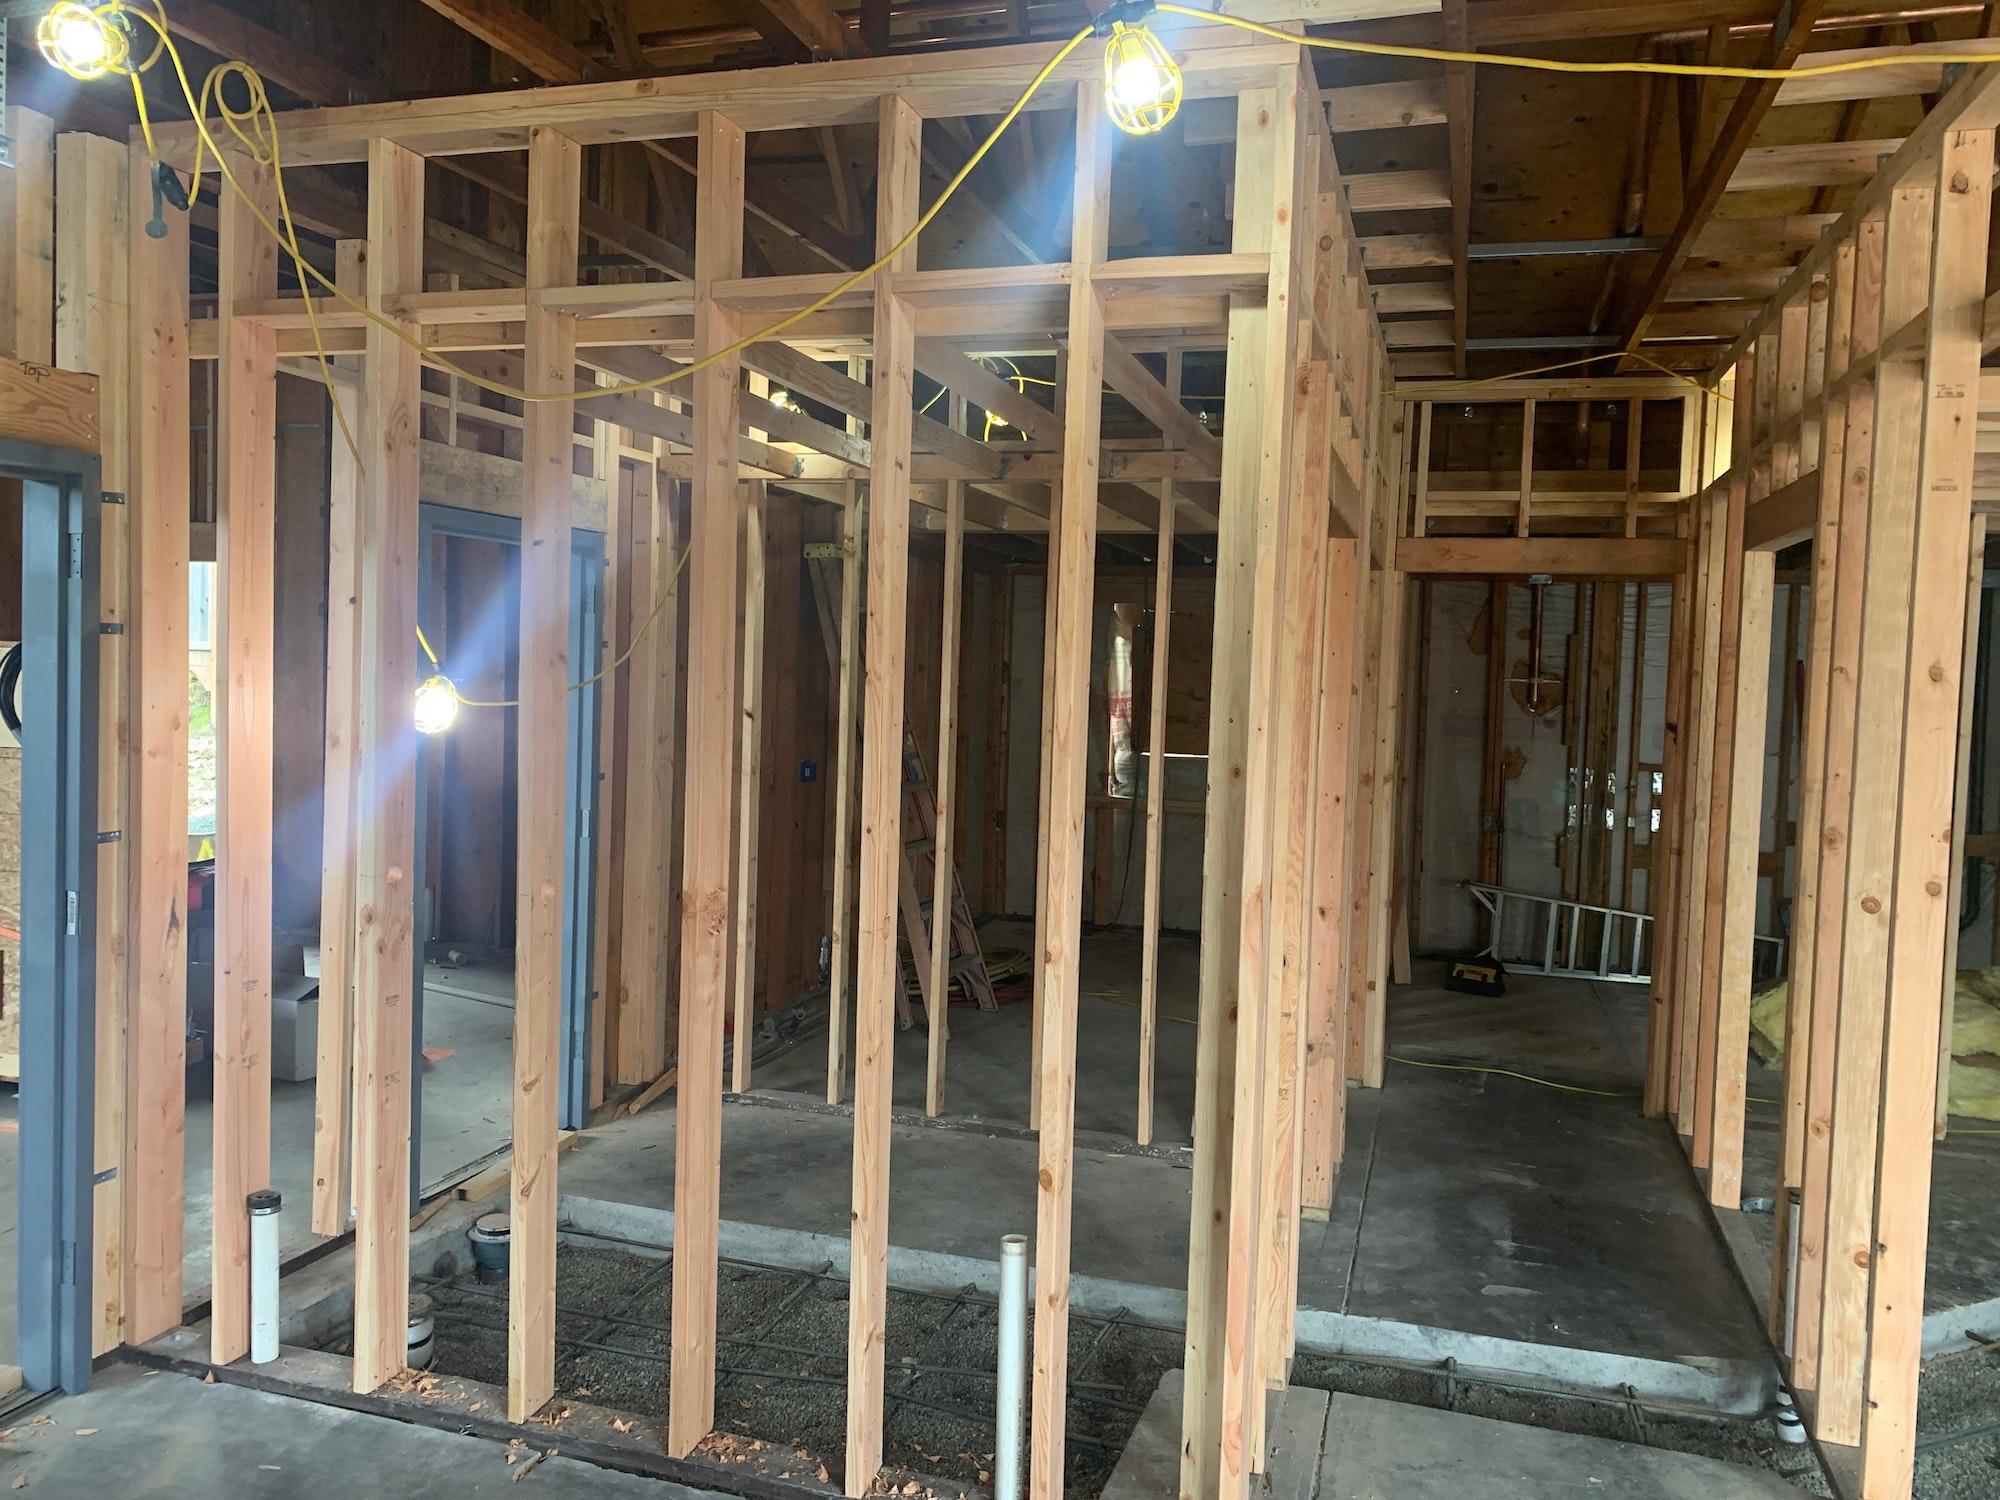 May contain: flooring, wood, floor, plywood, and door